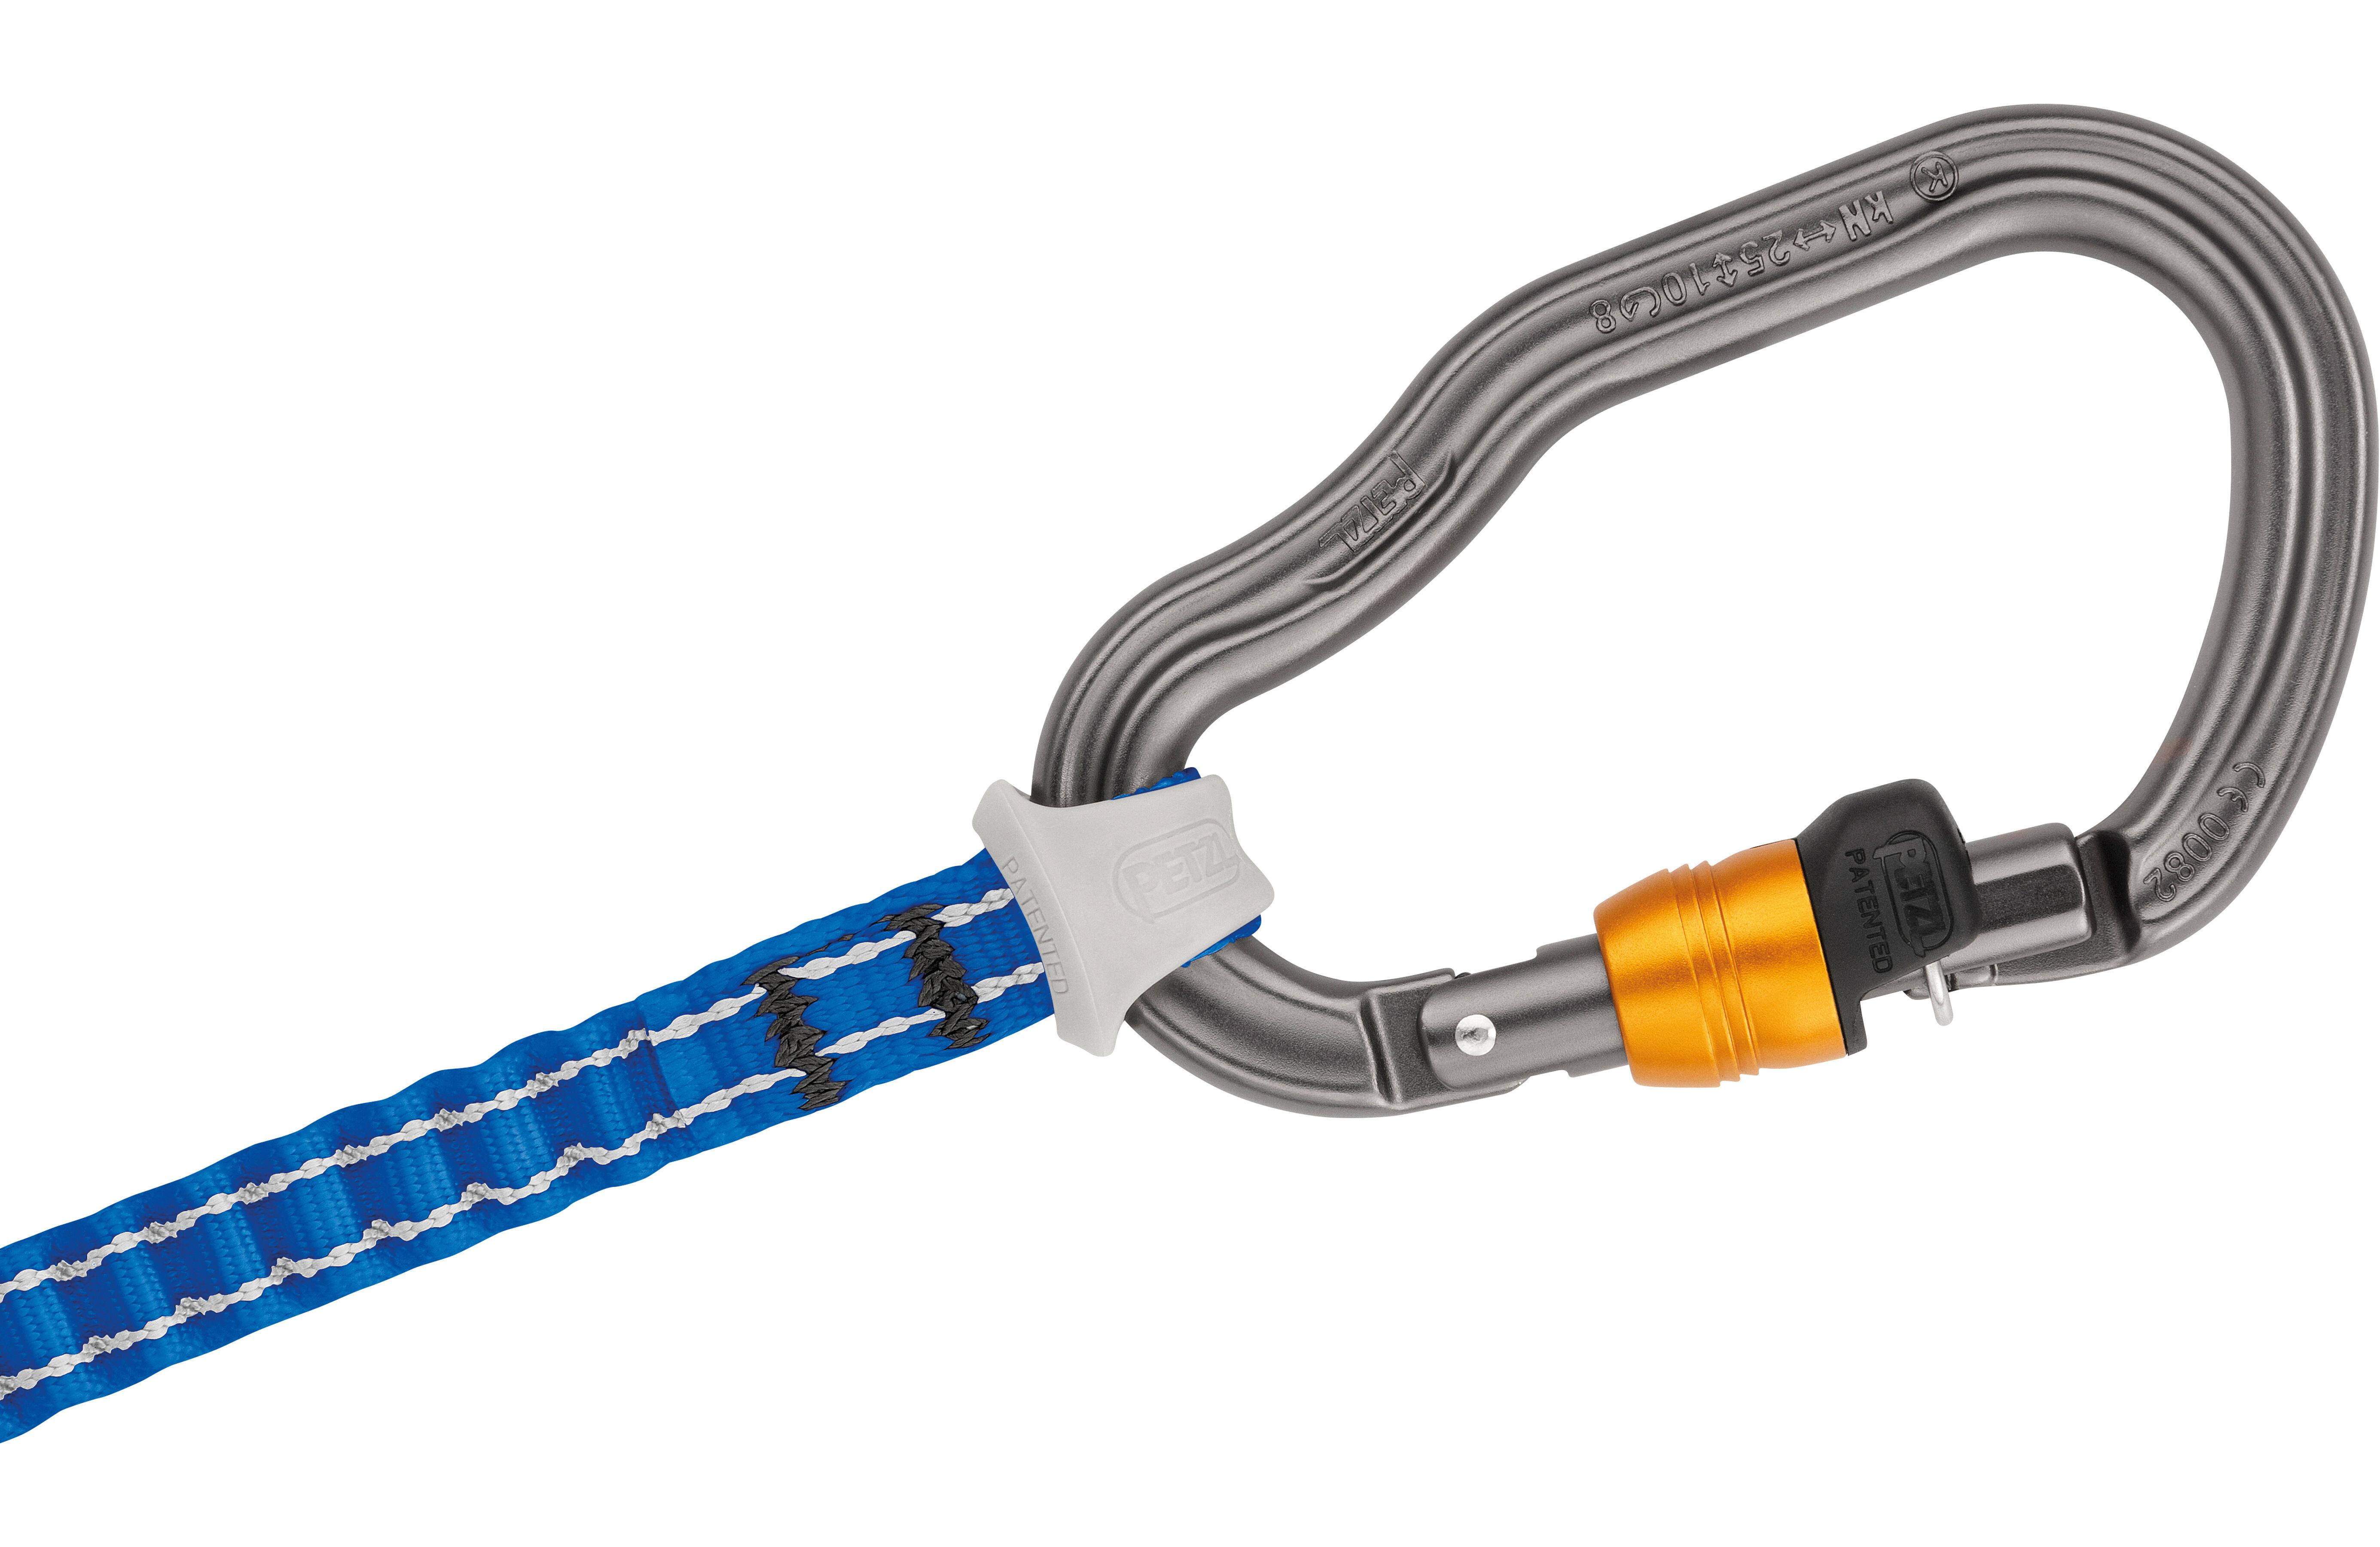 Klettersteigset Mit Bremse : Petzl kit via ferrata vertigo klettersteig komplettset mit elios